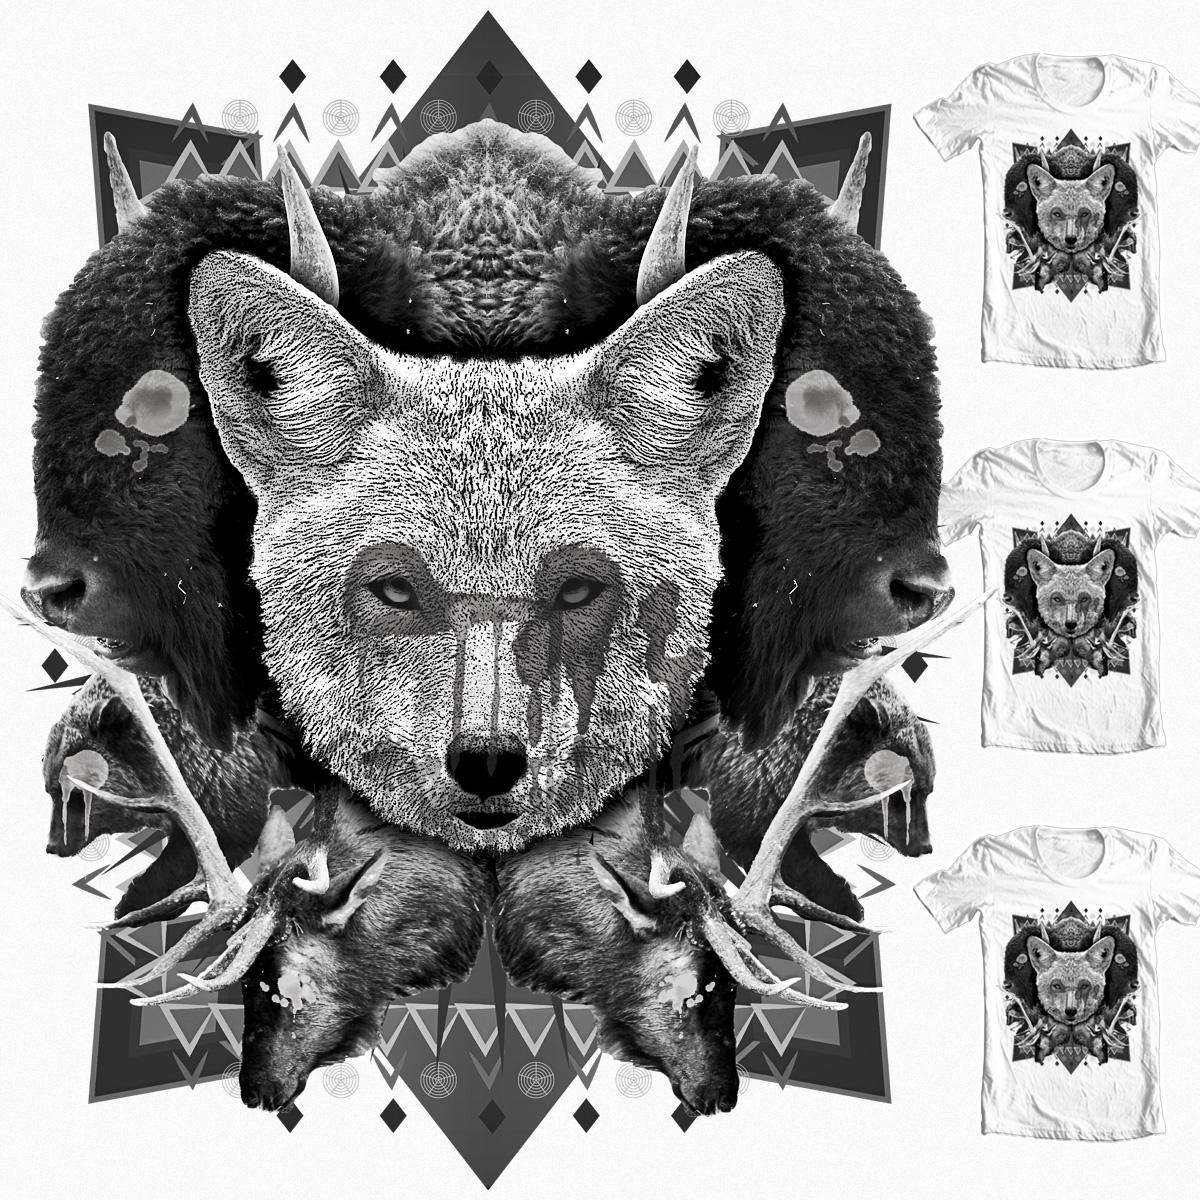 Animal Kingdom by PolySciGuy on Threadless